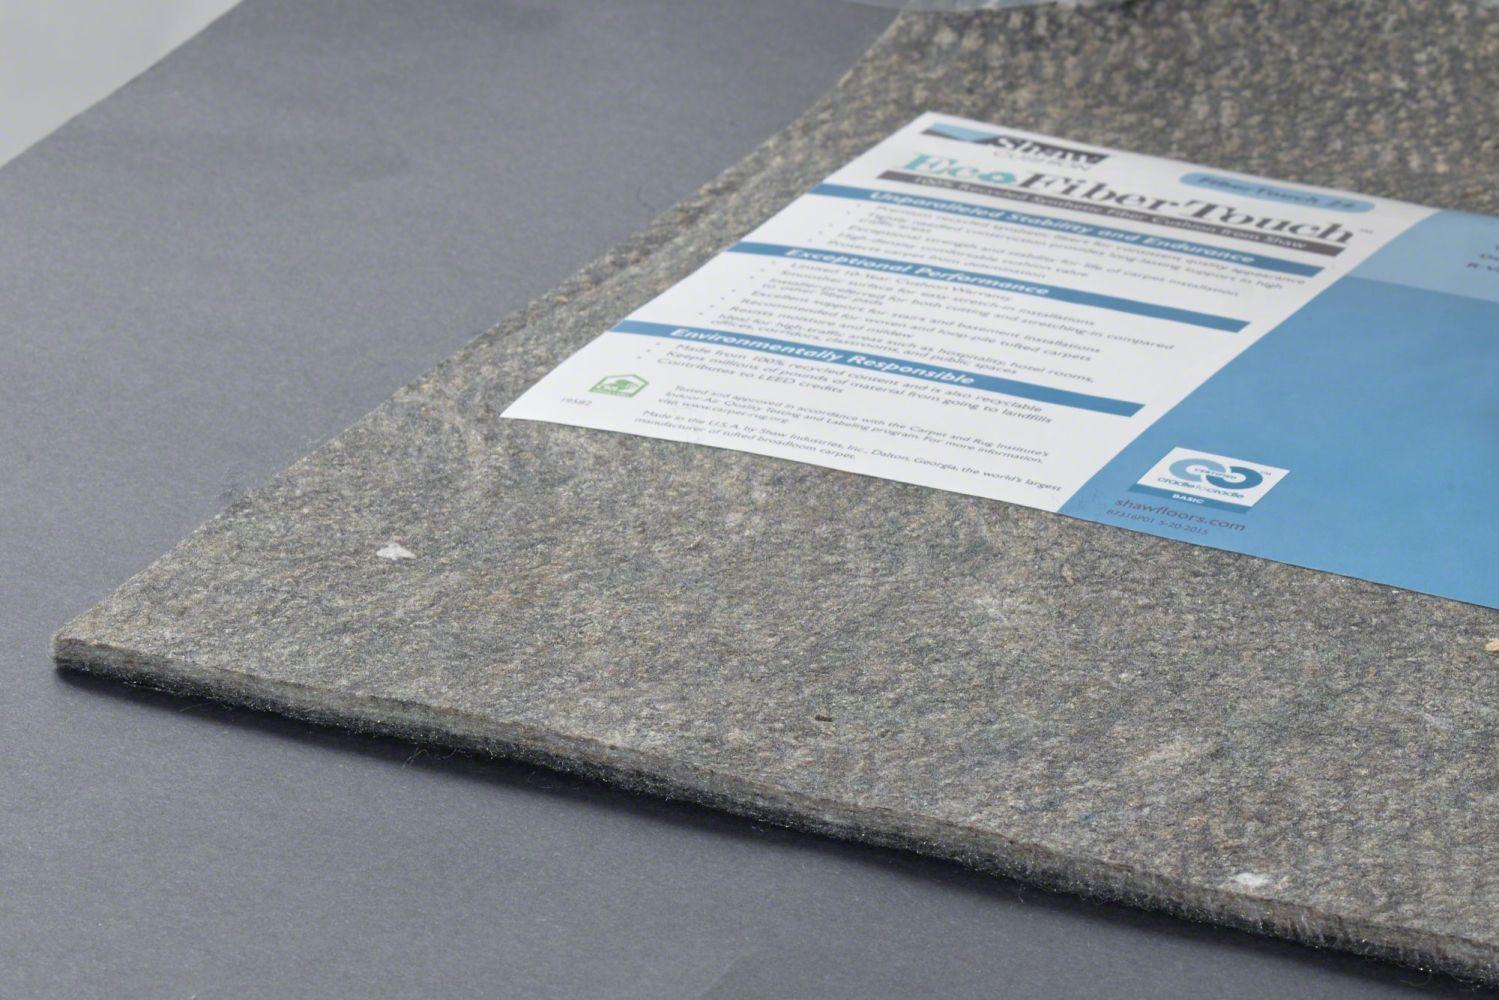 Shaw Floors Eco Edge Cushion Div3fibert24-6 Grey 00001_506PD